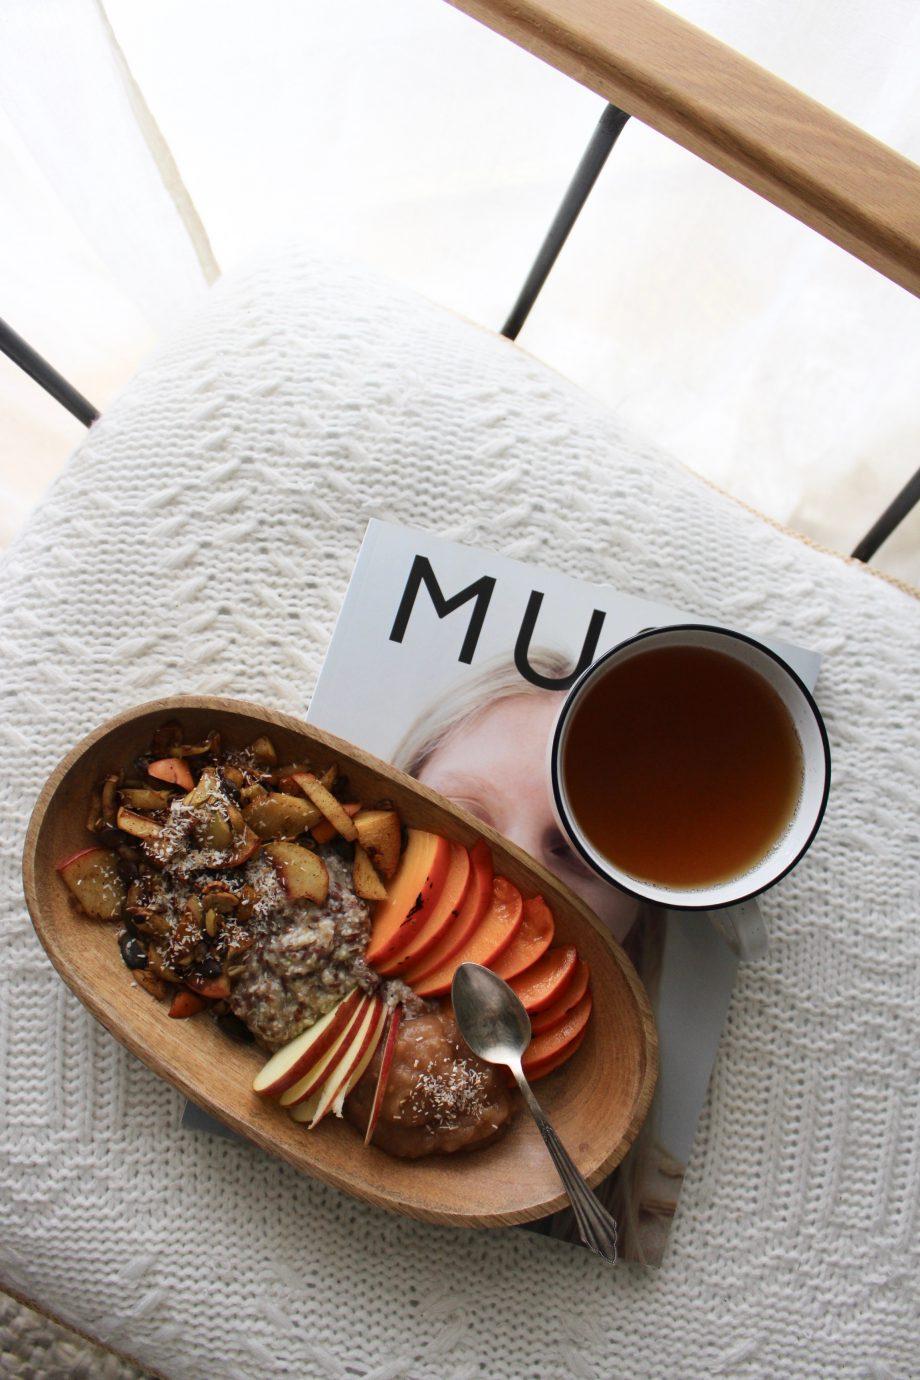 Apple Breakfast – dreierlei vom Apfel |18.01.2018